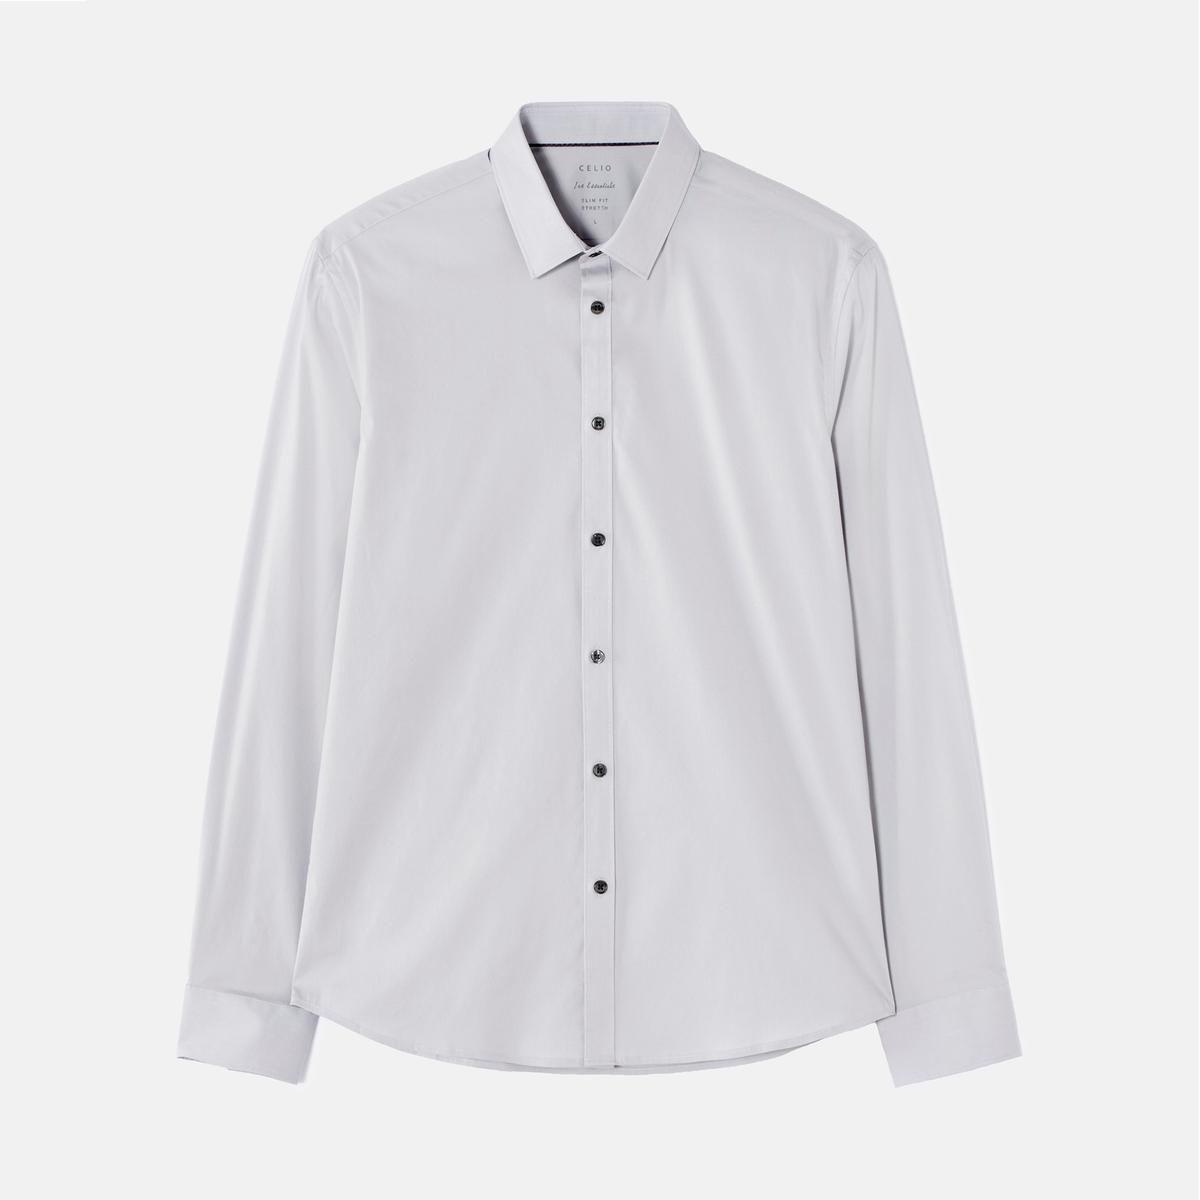 Рубашка из поплина стретч JASANTAL2